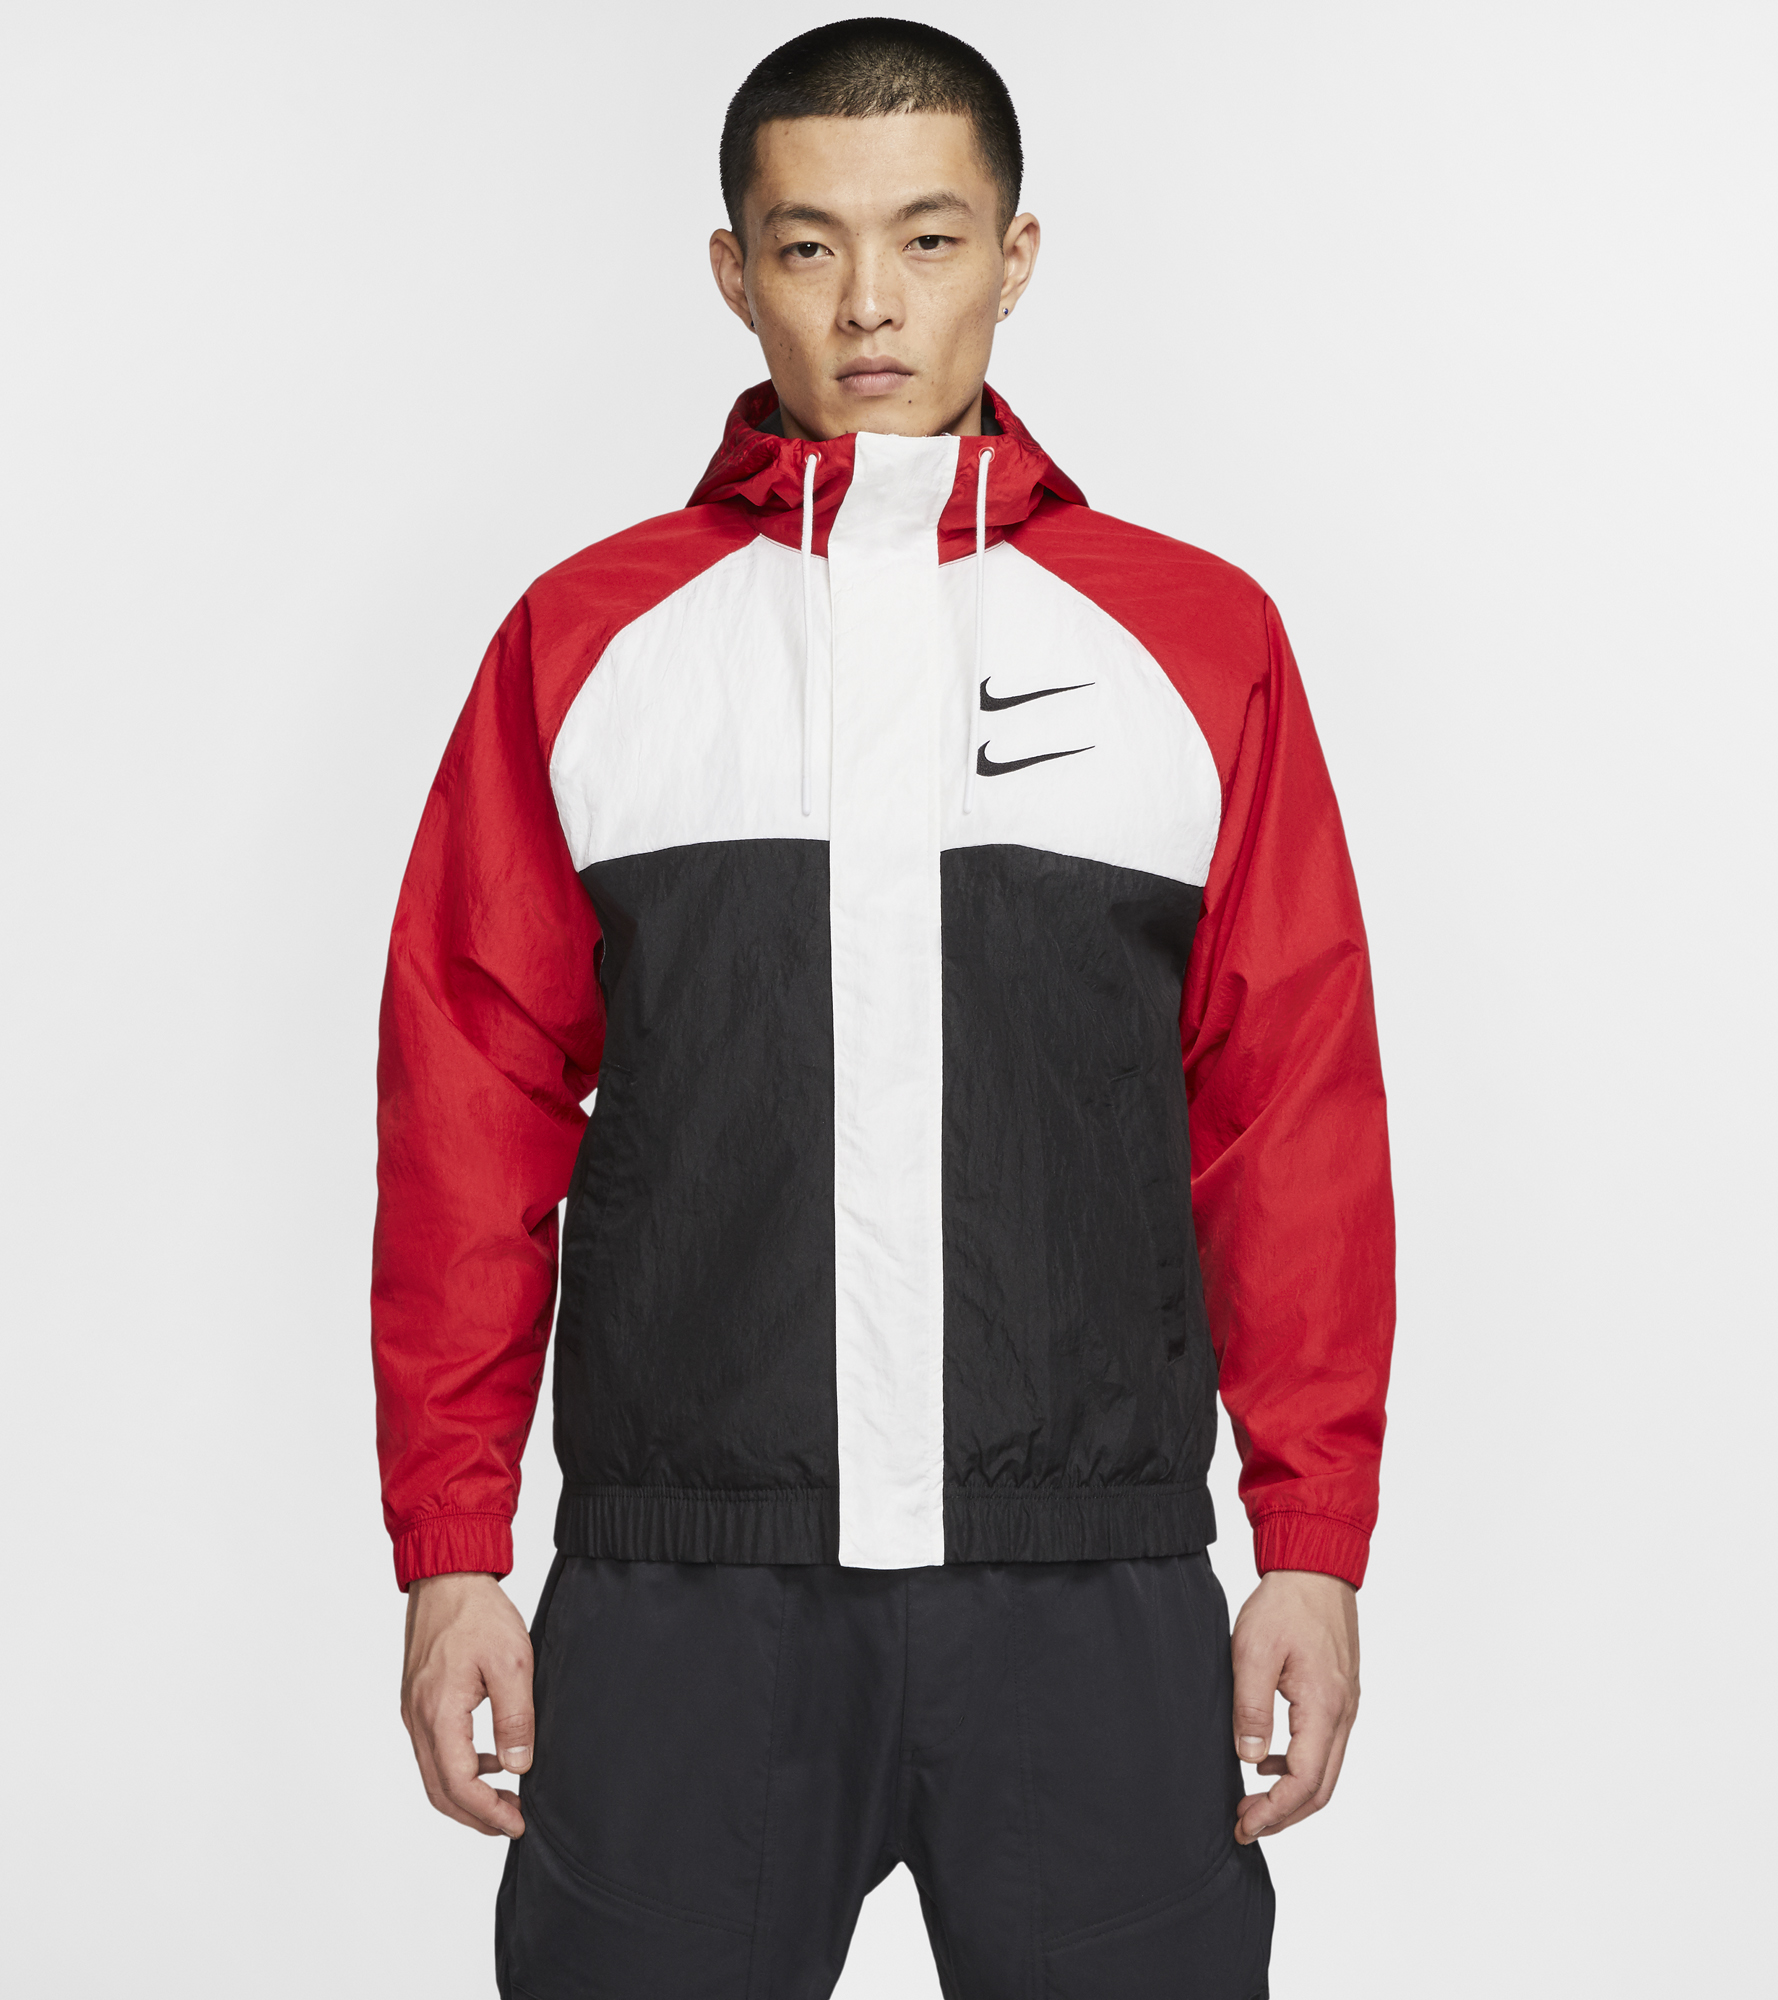 цена Nike Ветровка мужская Nike Sportswear Swoosh, размер 50-52 онлайн в 2017 году